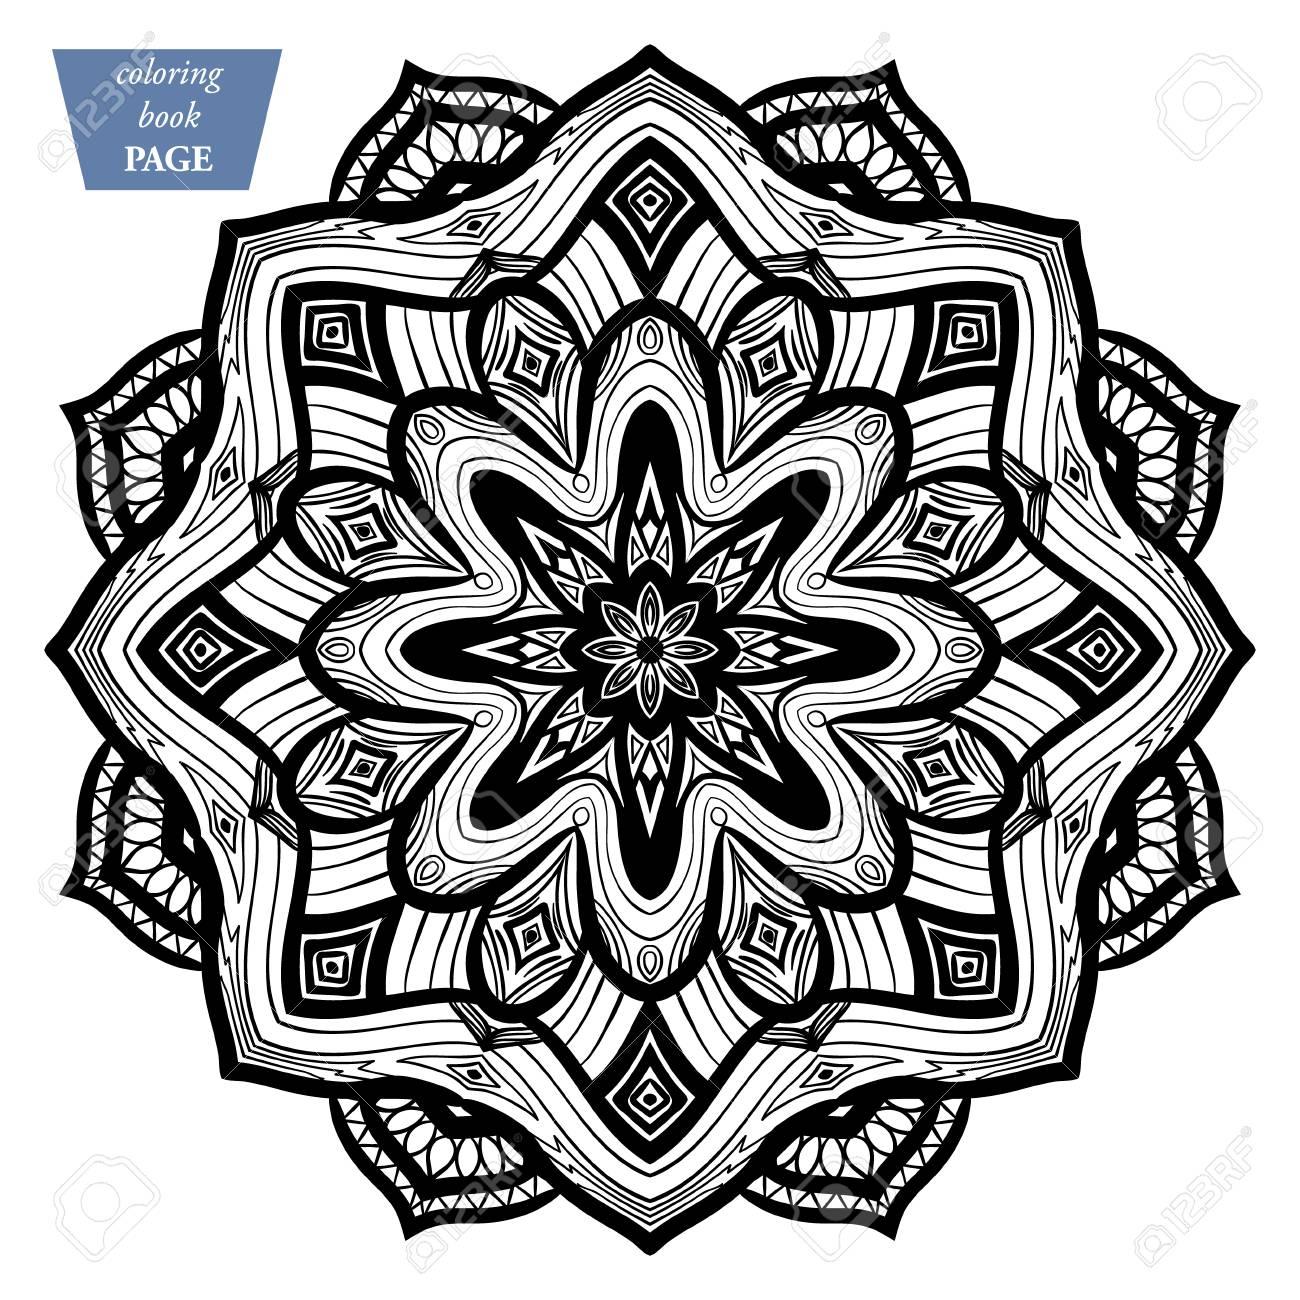 Mandala Coloring Page Vintage Decorative Elements Oriental Pattern Vector Illustration H Stock